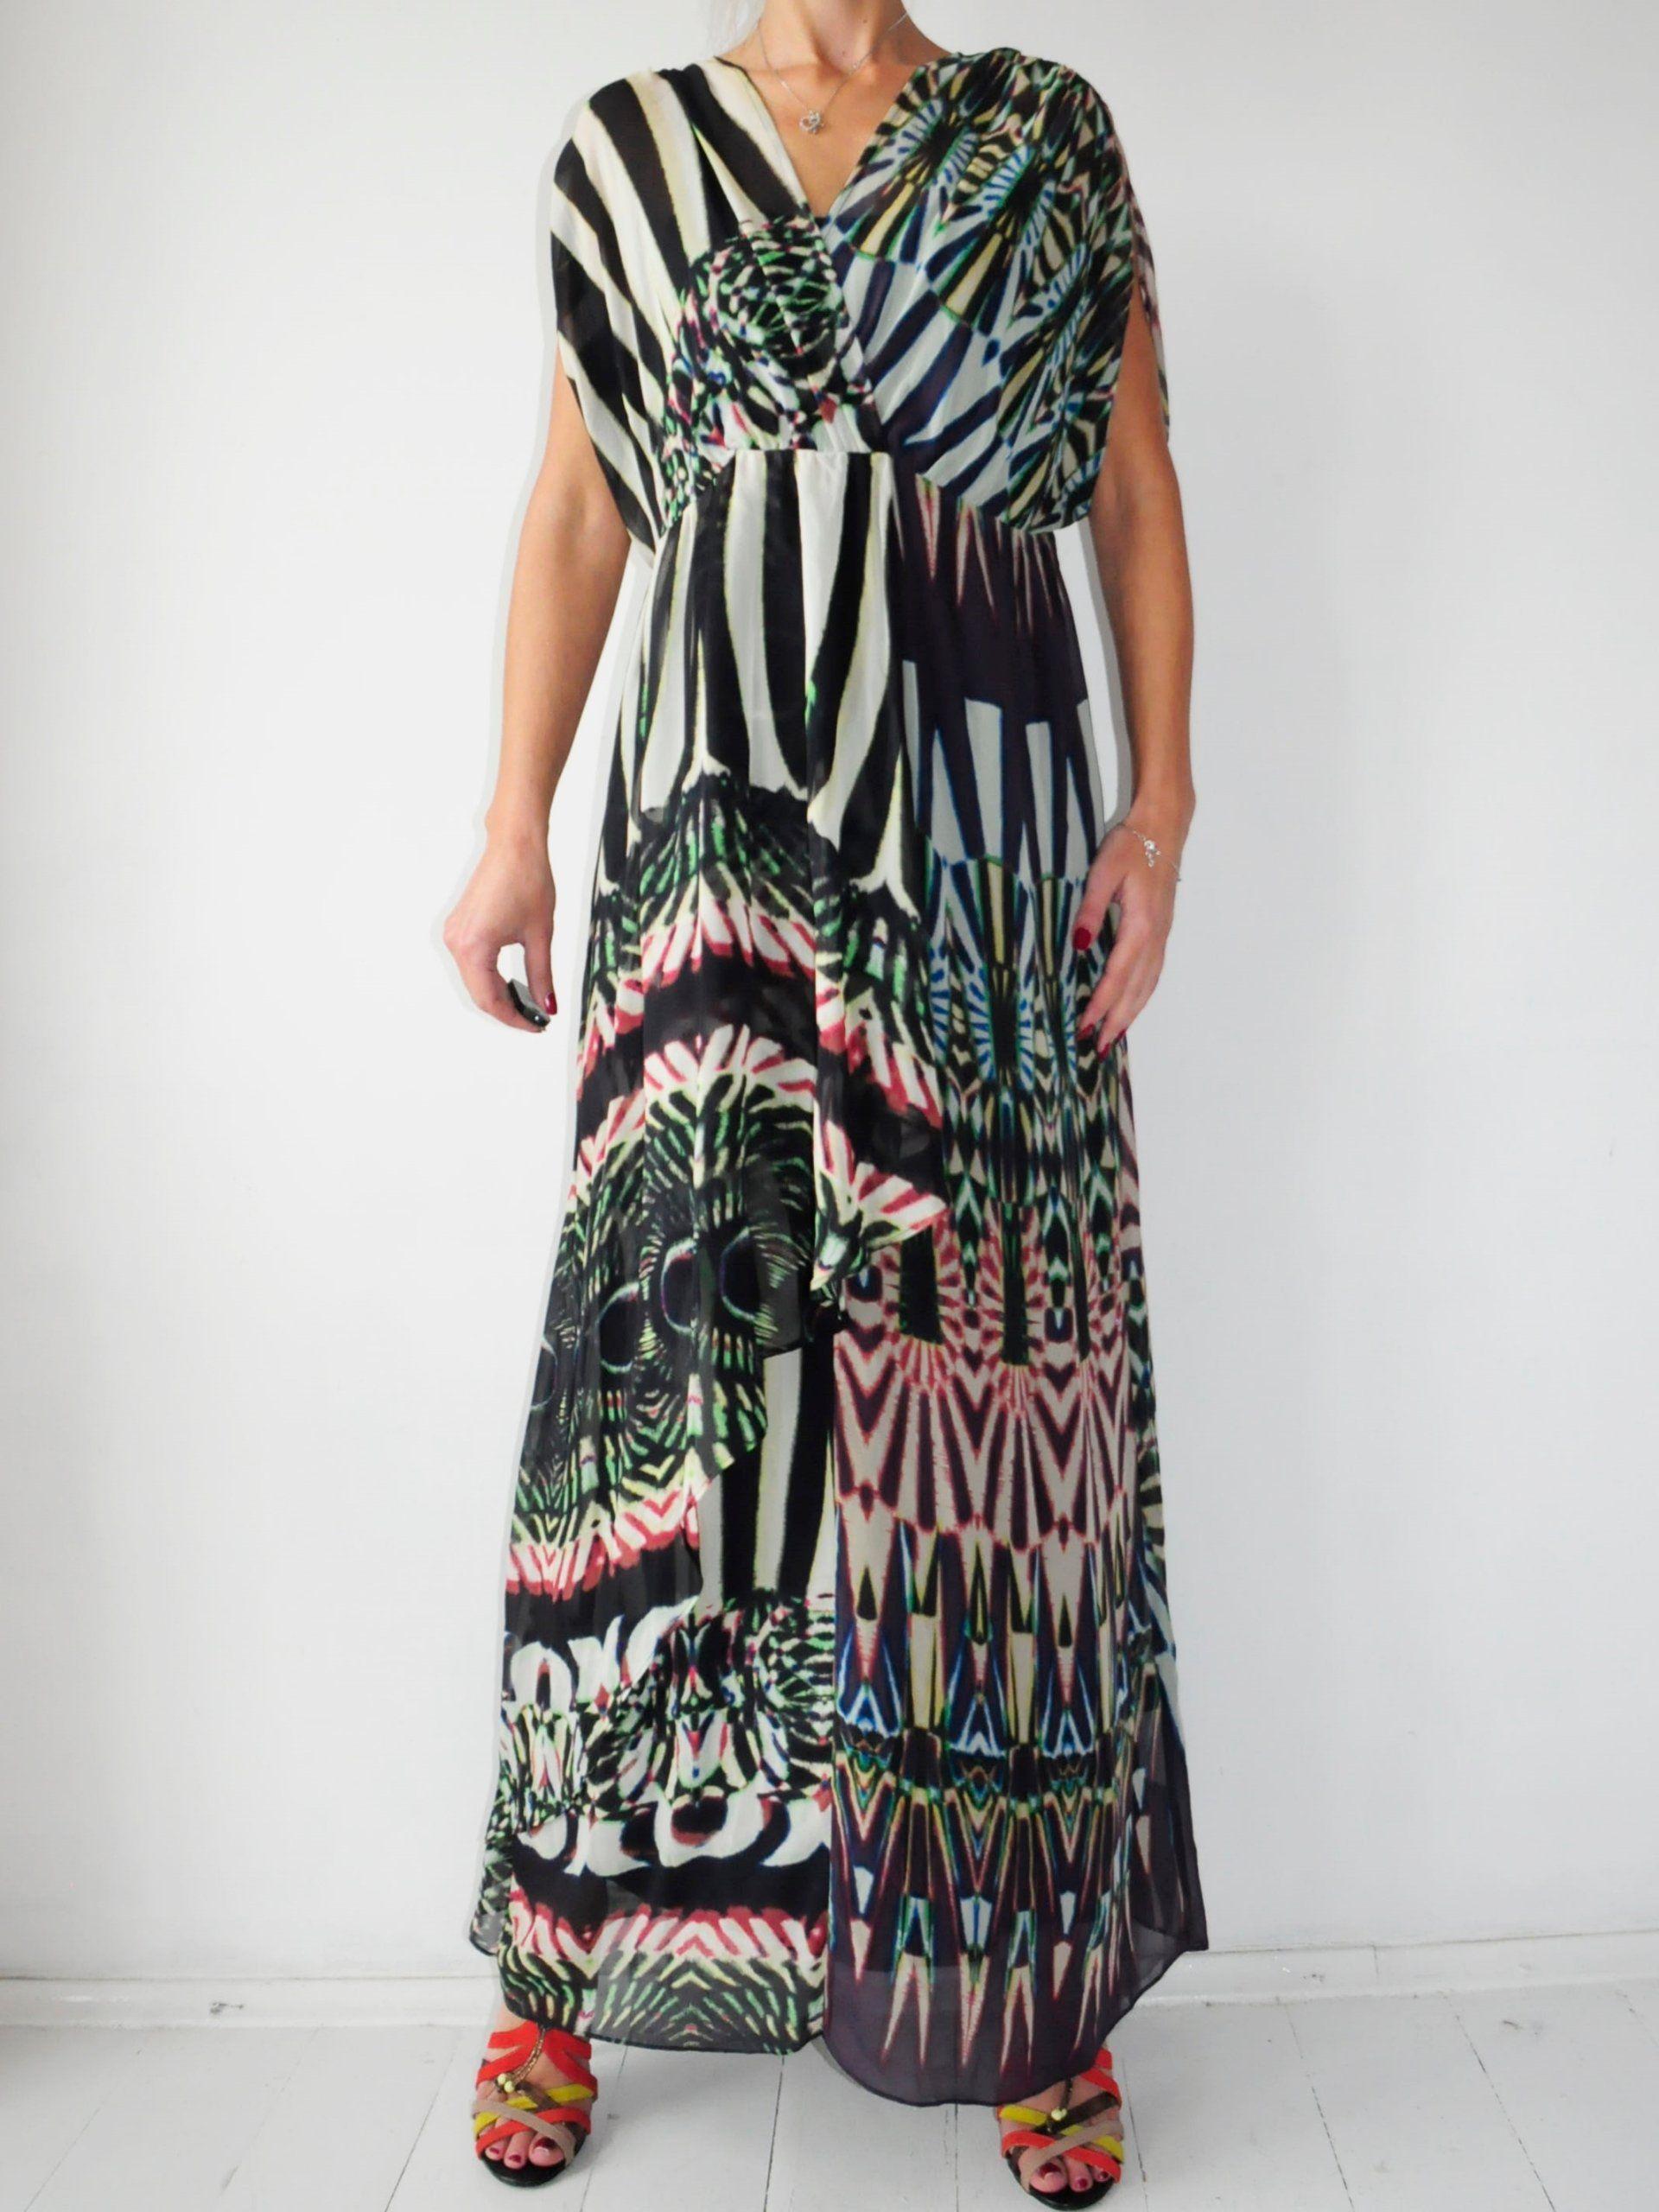 Planet Wzorzysta Dluga Sukienka Wzorek 40 7028648967 Oficjalne Archiwum Allegro Maxi Dress Fashion Dresses With Sleeves